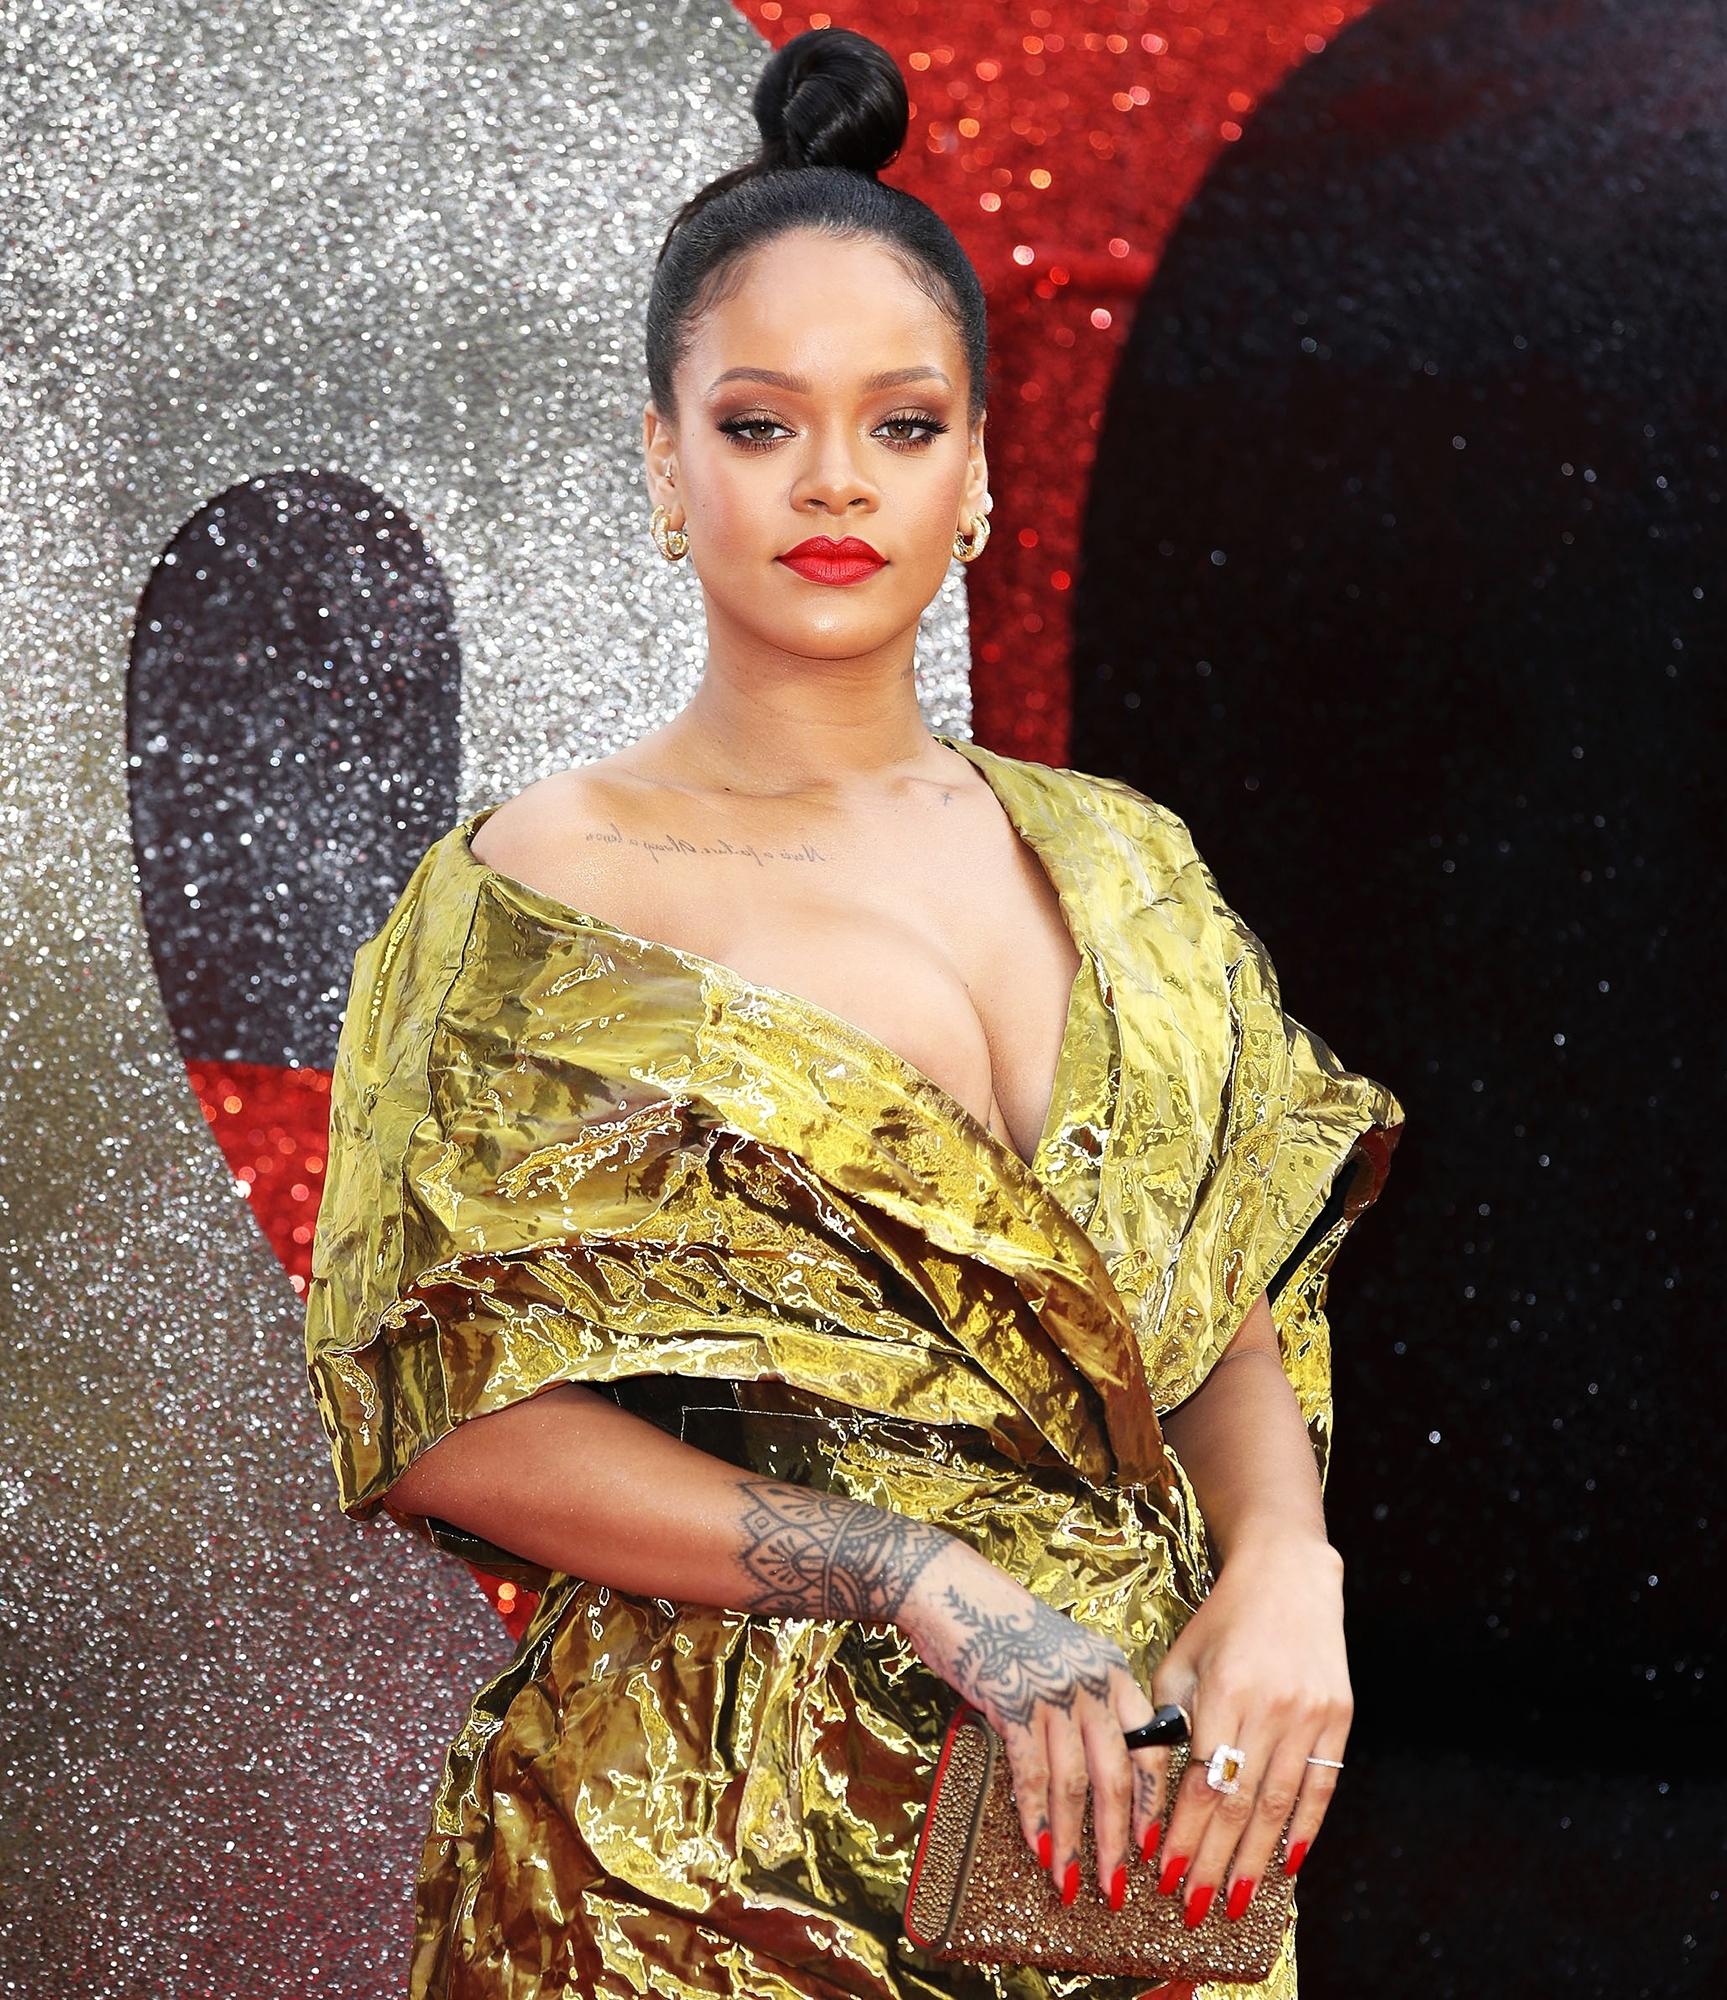 Rihanna Declined Super Bowl Liii Halftime Show Offer with regard to Rihanna Super Bowl 2019